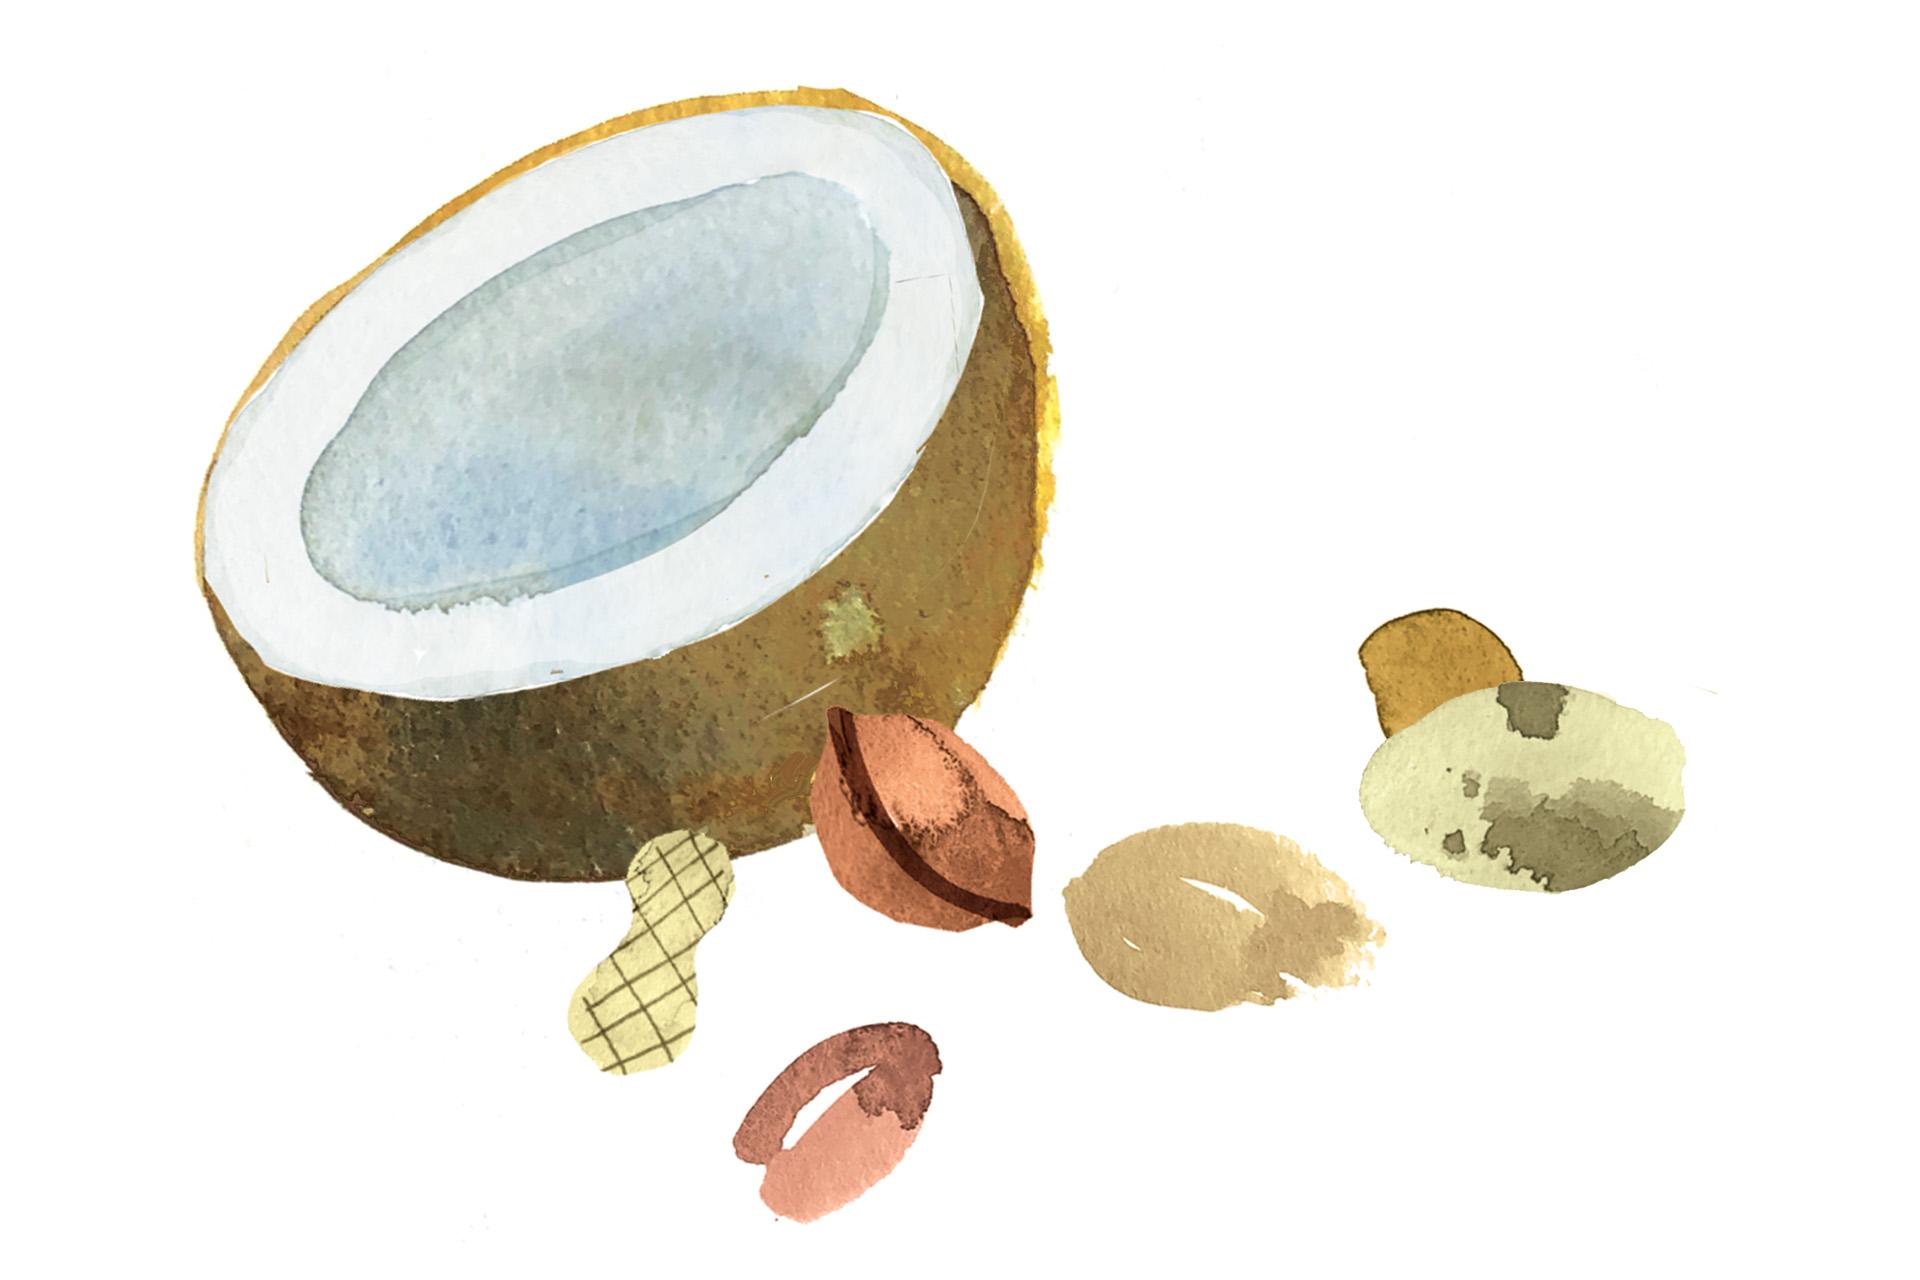 Illustration of coconuts